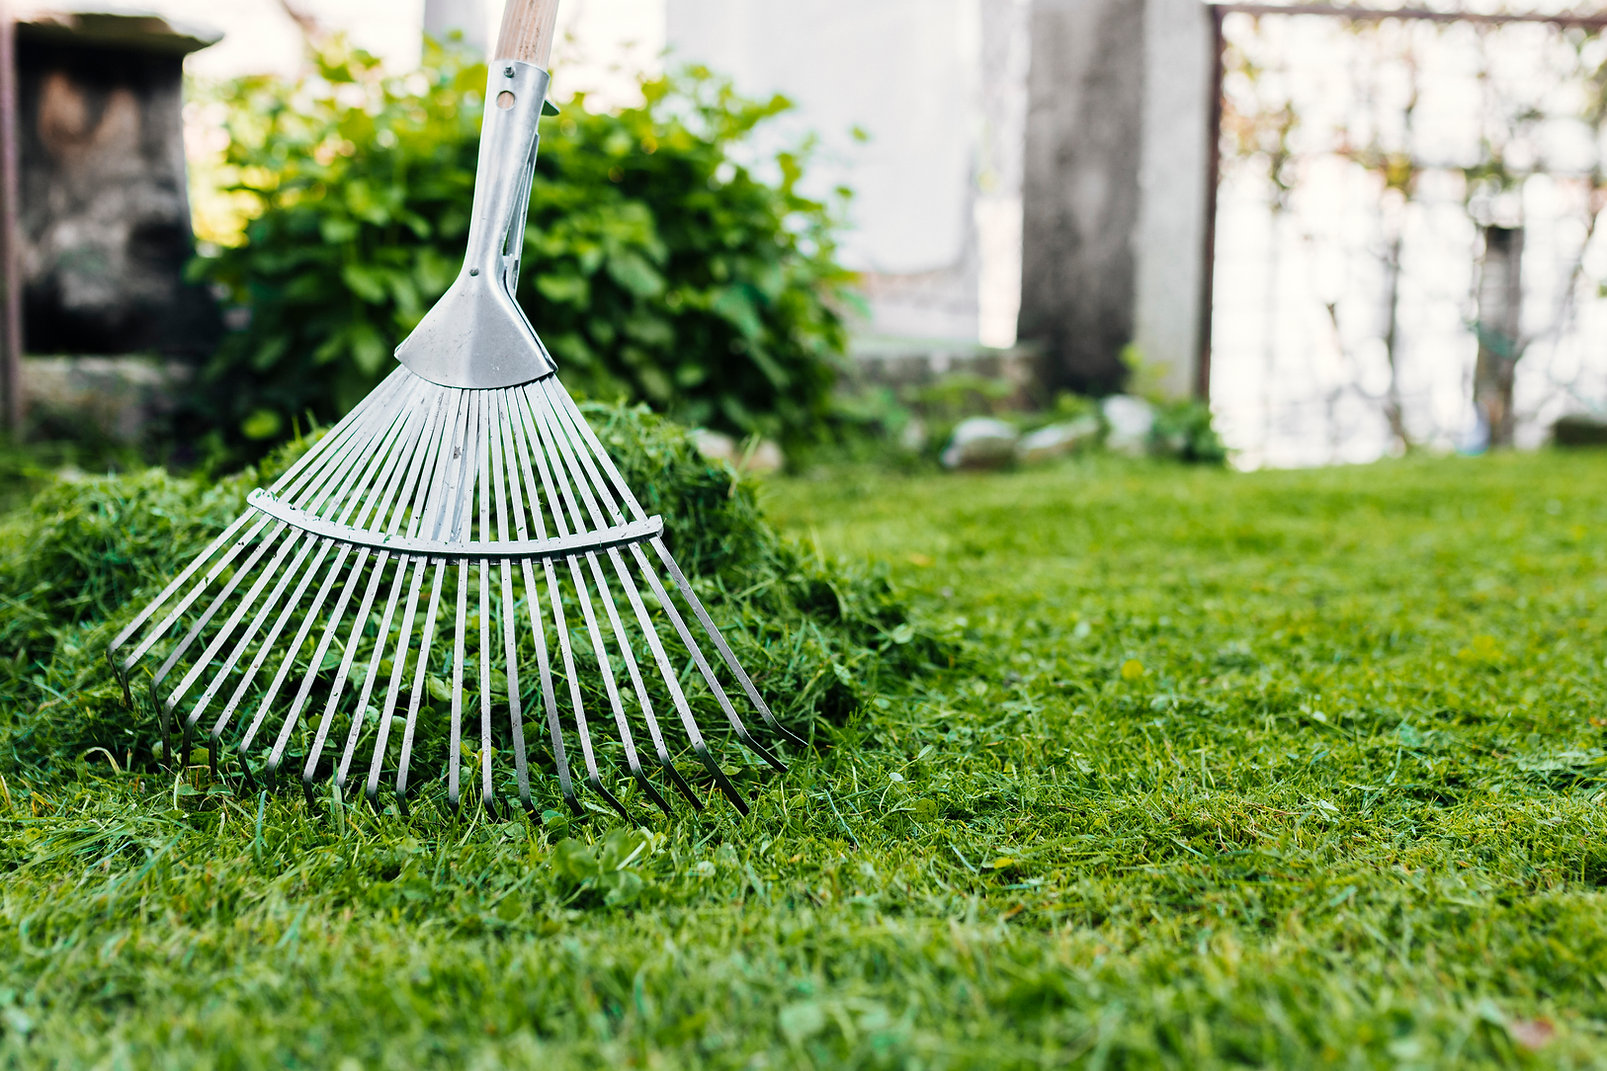 front-view-raking-the-grass.jpg